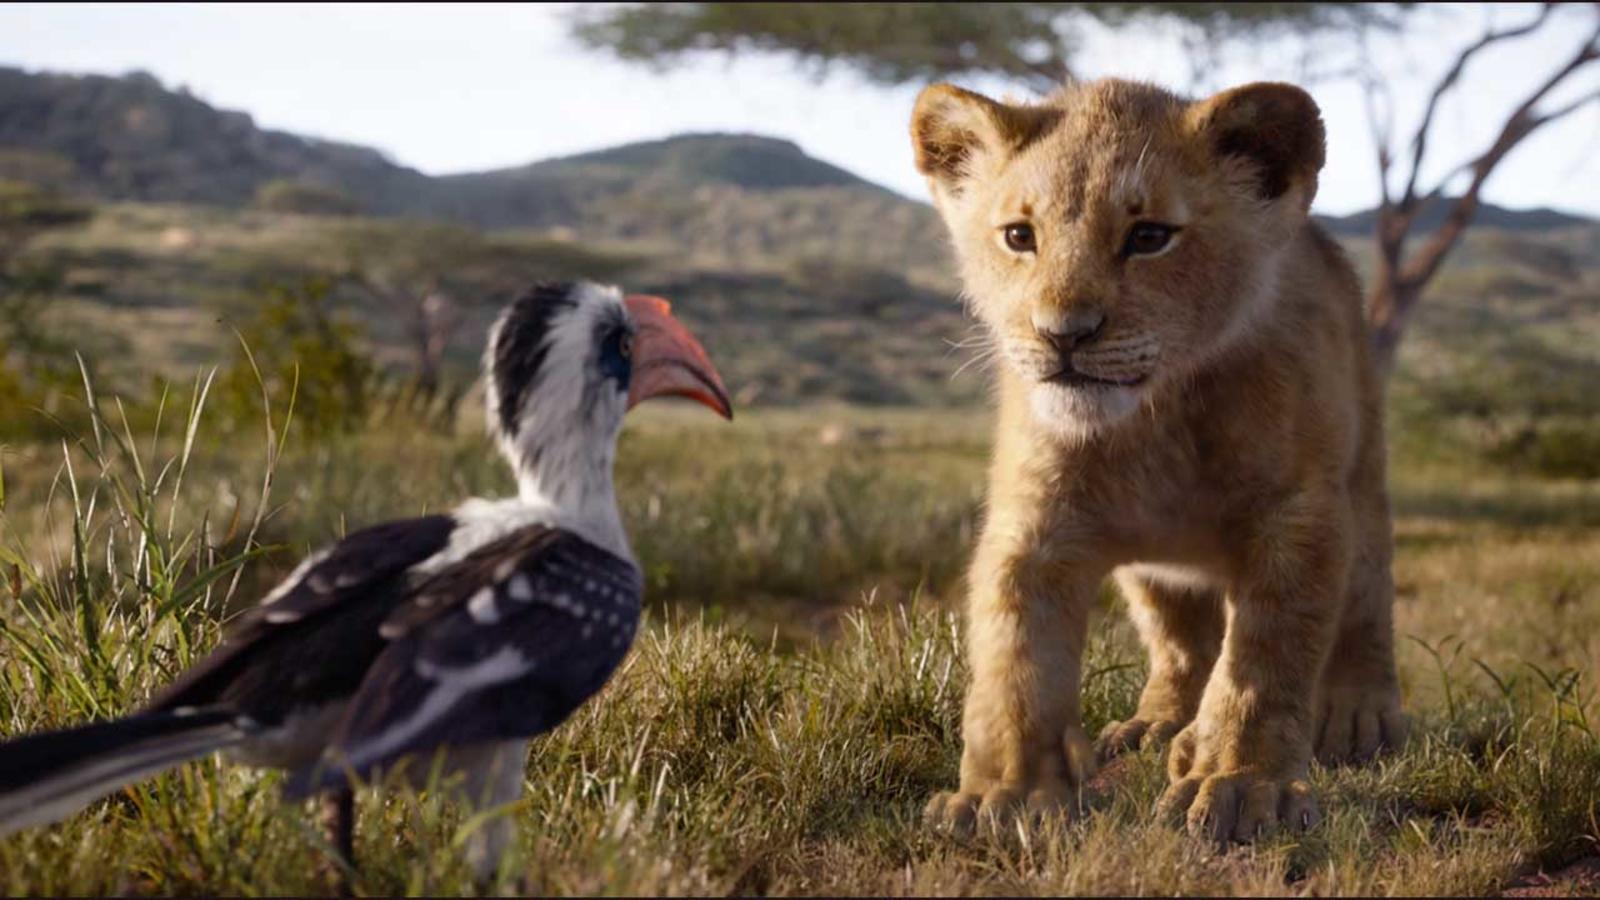 Lion King 2019 Trailer James Earl Jones Recites Iconic Mufasa Lines In Nostalgia Packed New Spot Abc13 Houston